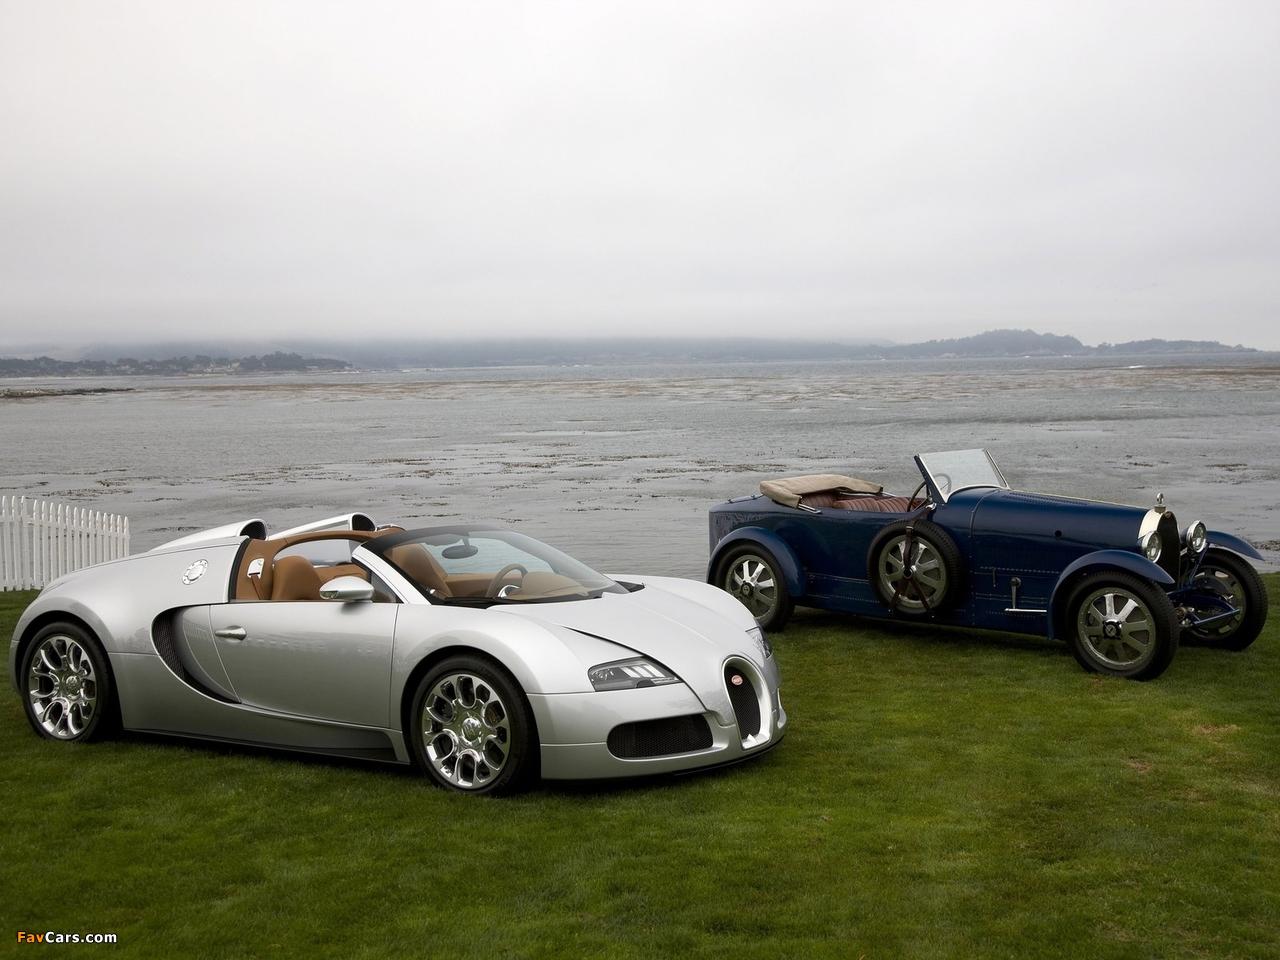 Bugatti wallpapers (1280 x 960)